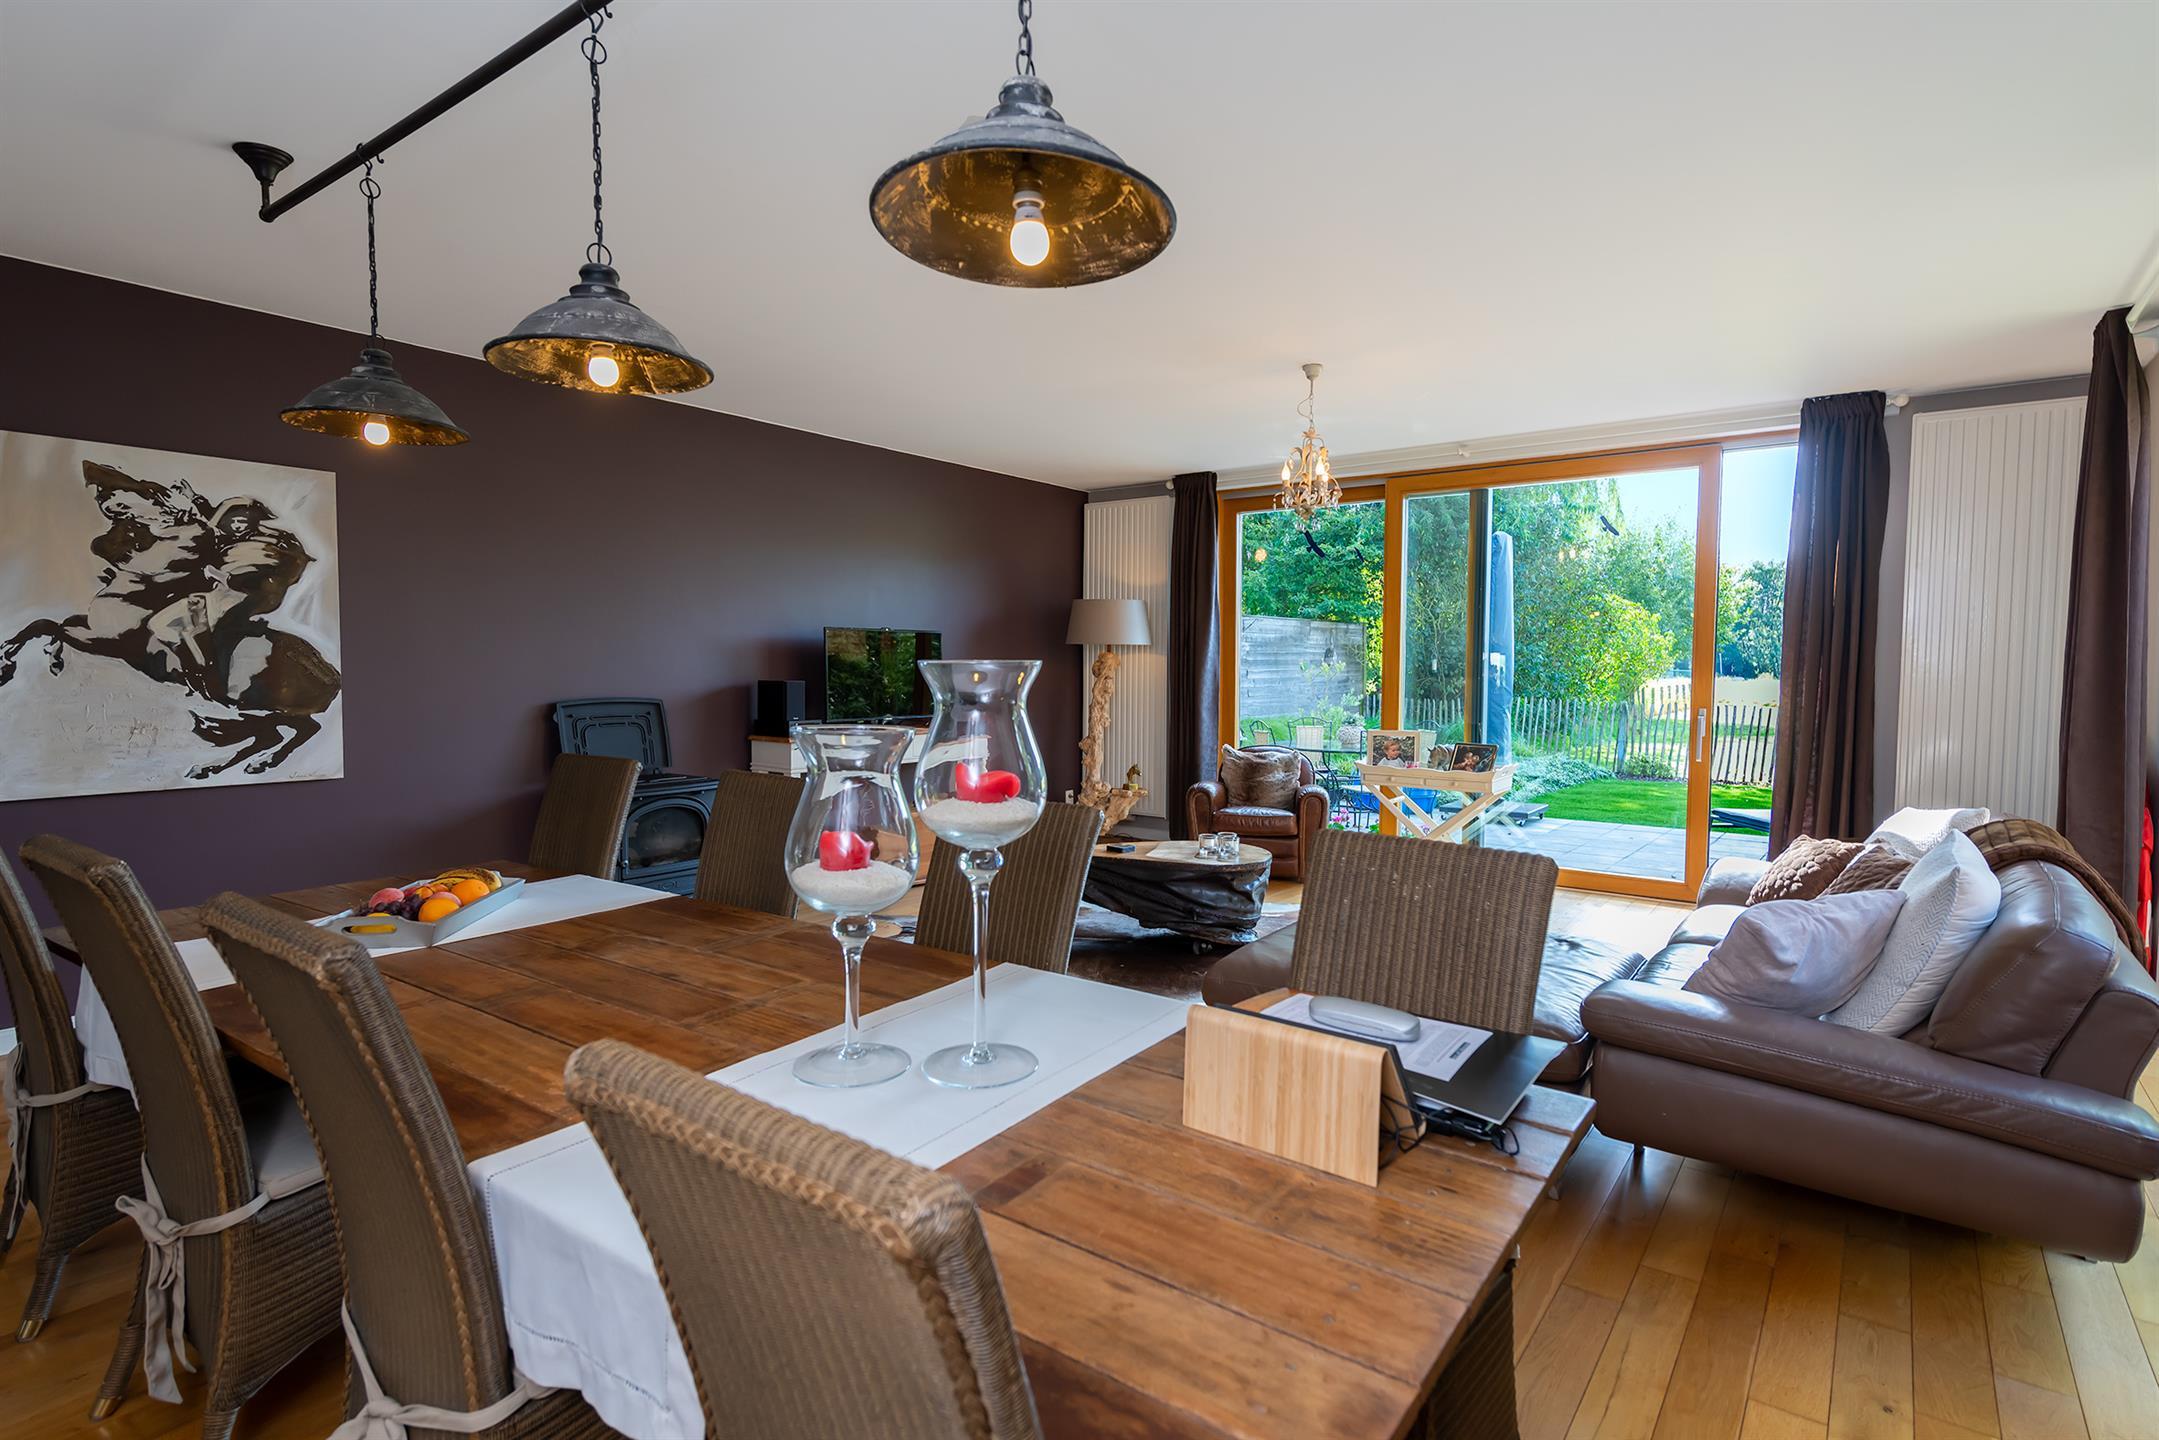 Charmant huis - Sint-Katelijne-Waver - #4492892-2